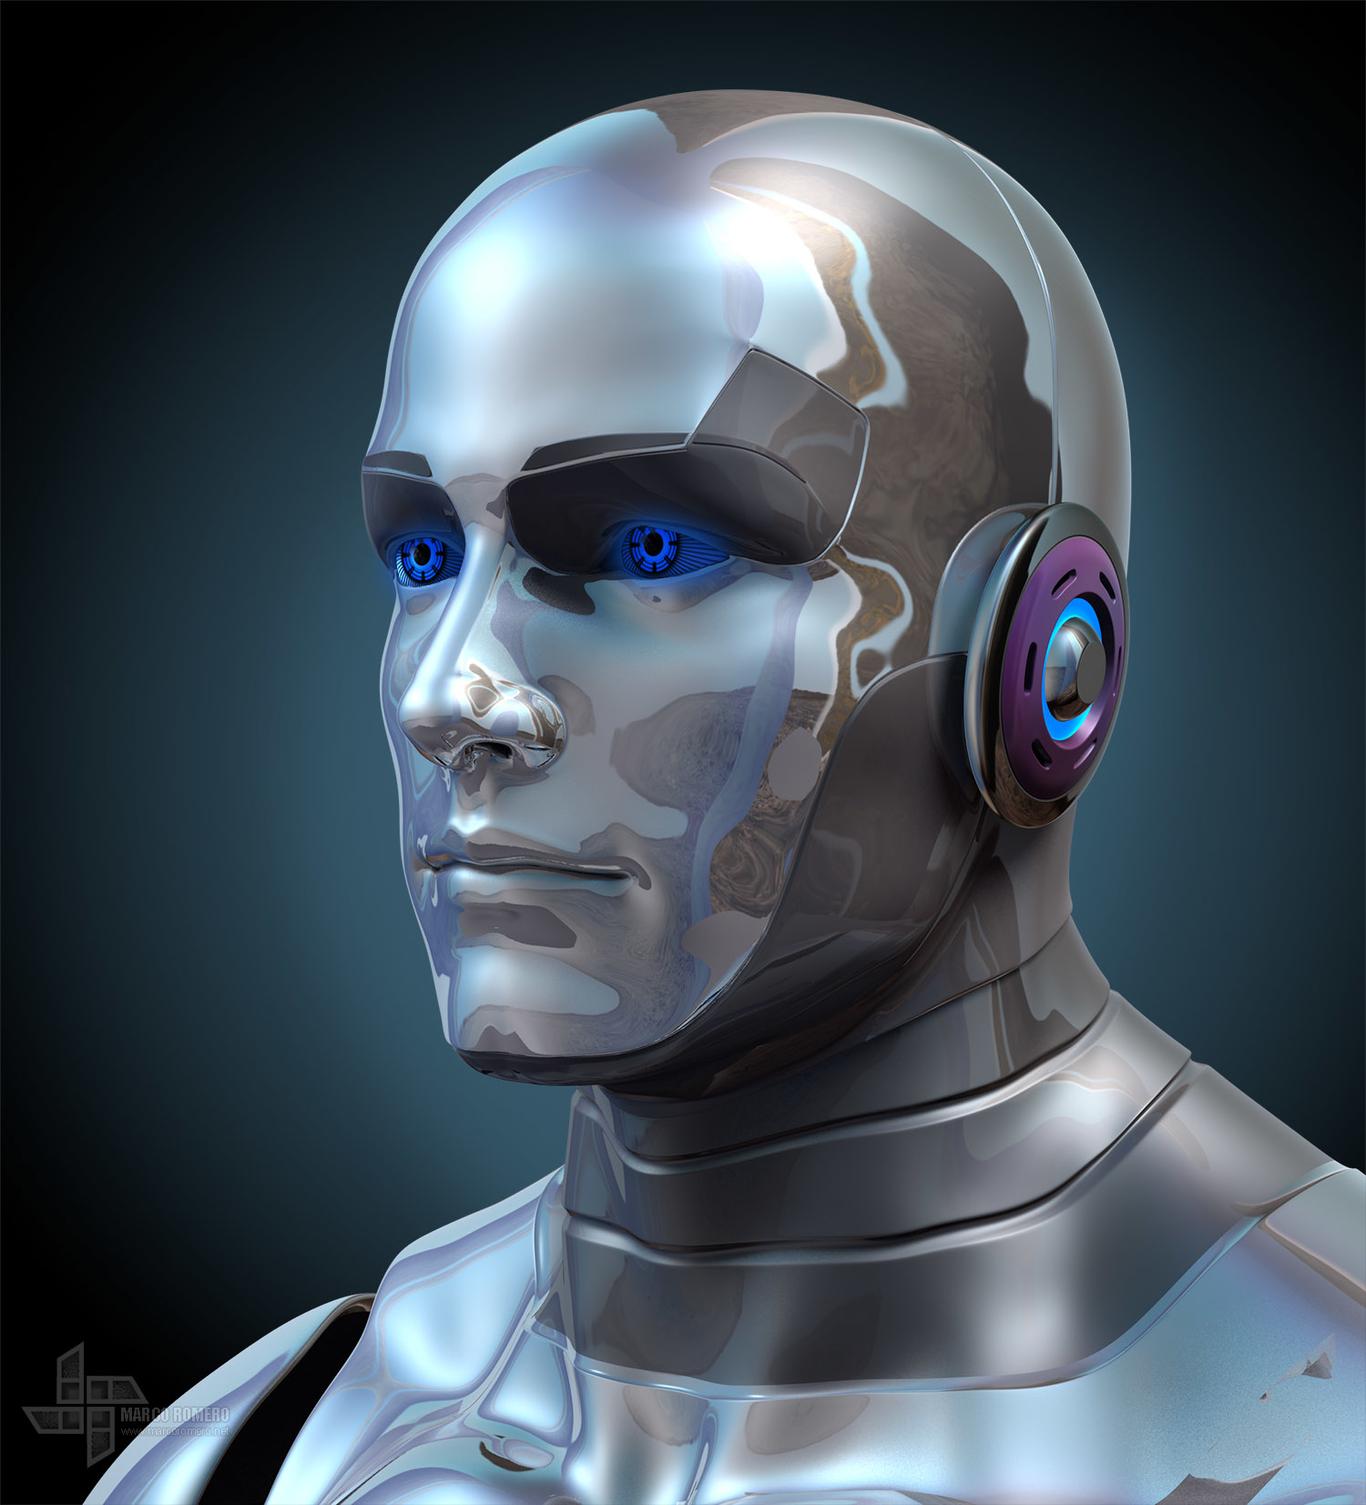 Maromero male robot 1 28bbfea2 v4z3